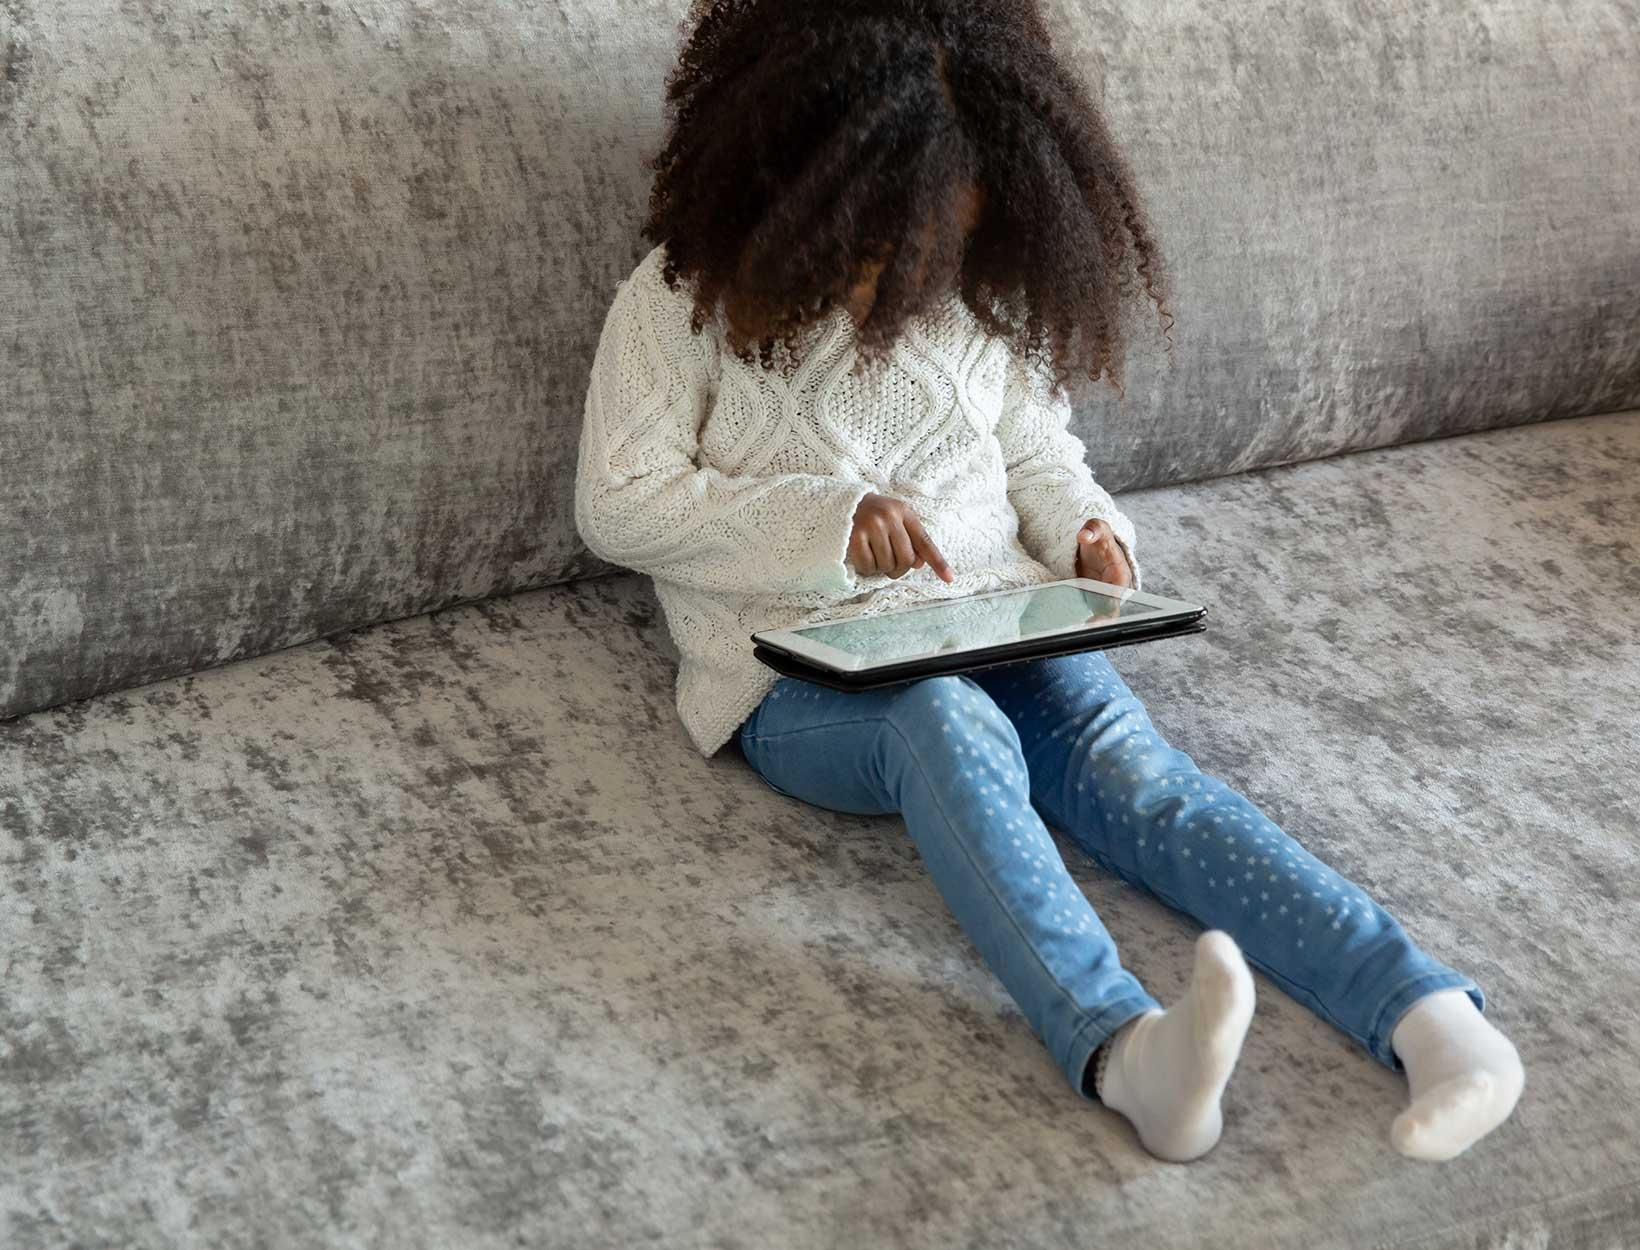 The Key to Raising Self-Reliant Kids